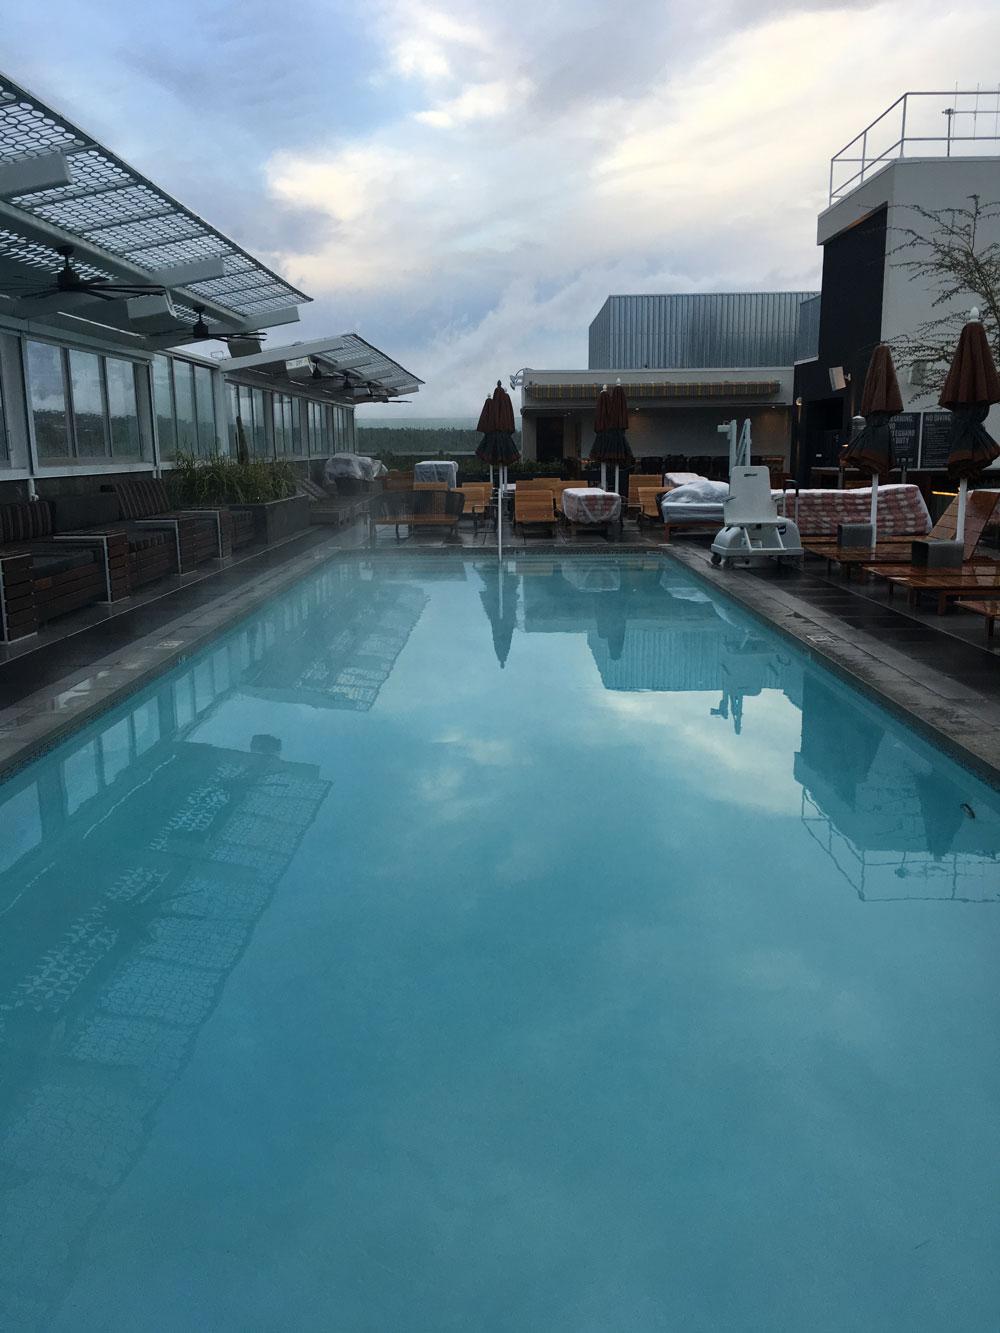 Rowan-hotel1.jpg